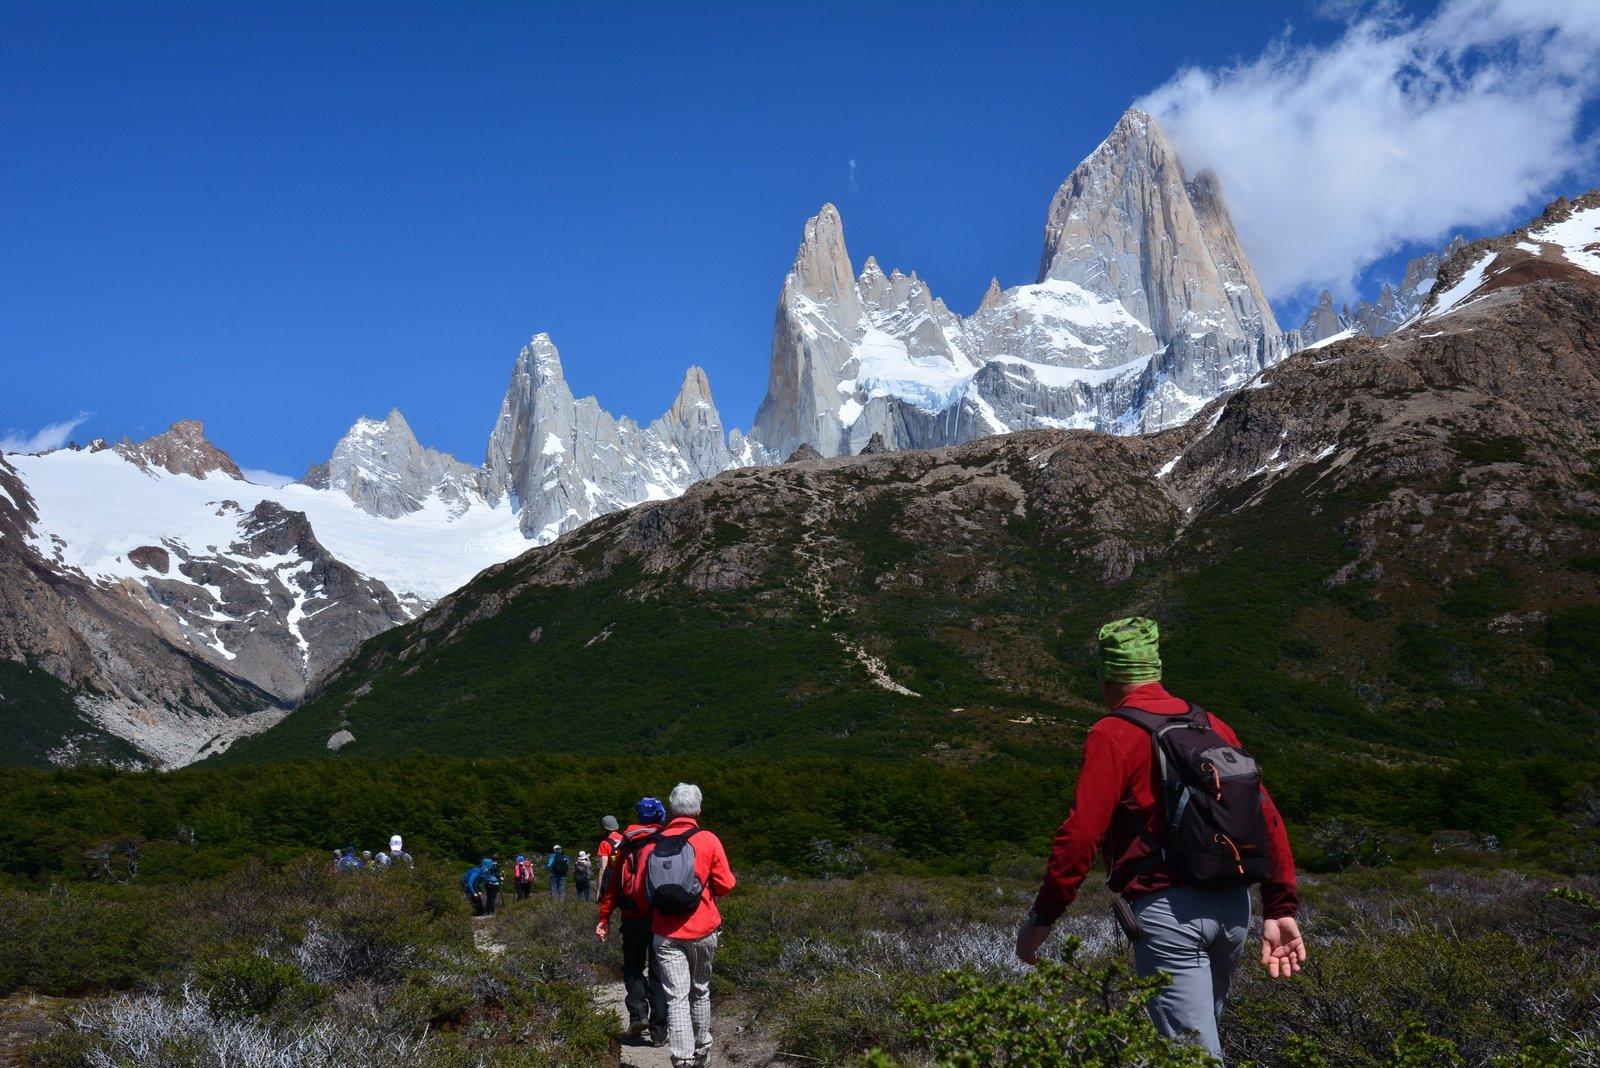 patagonia-argentina-verso-il-fitzroy